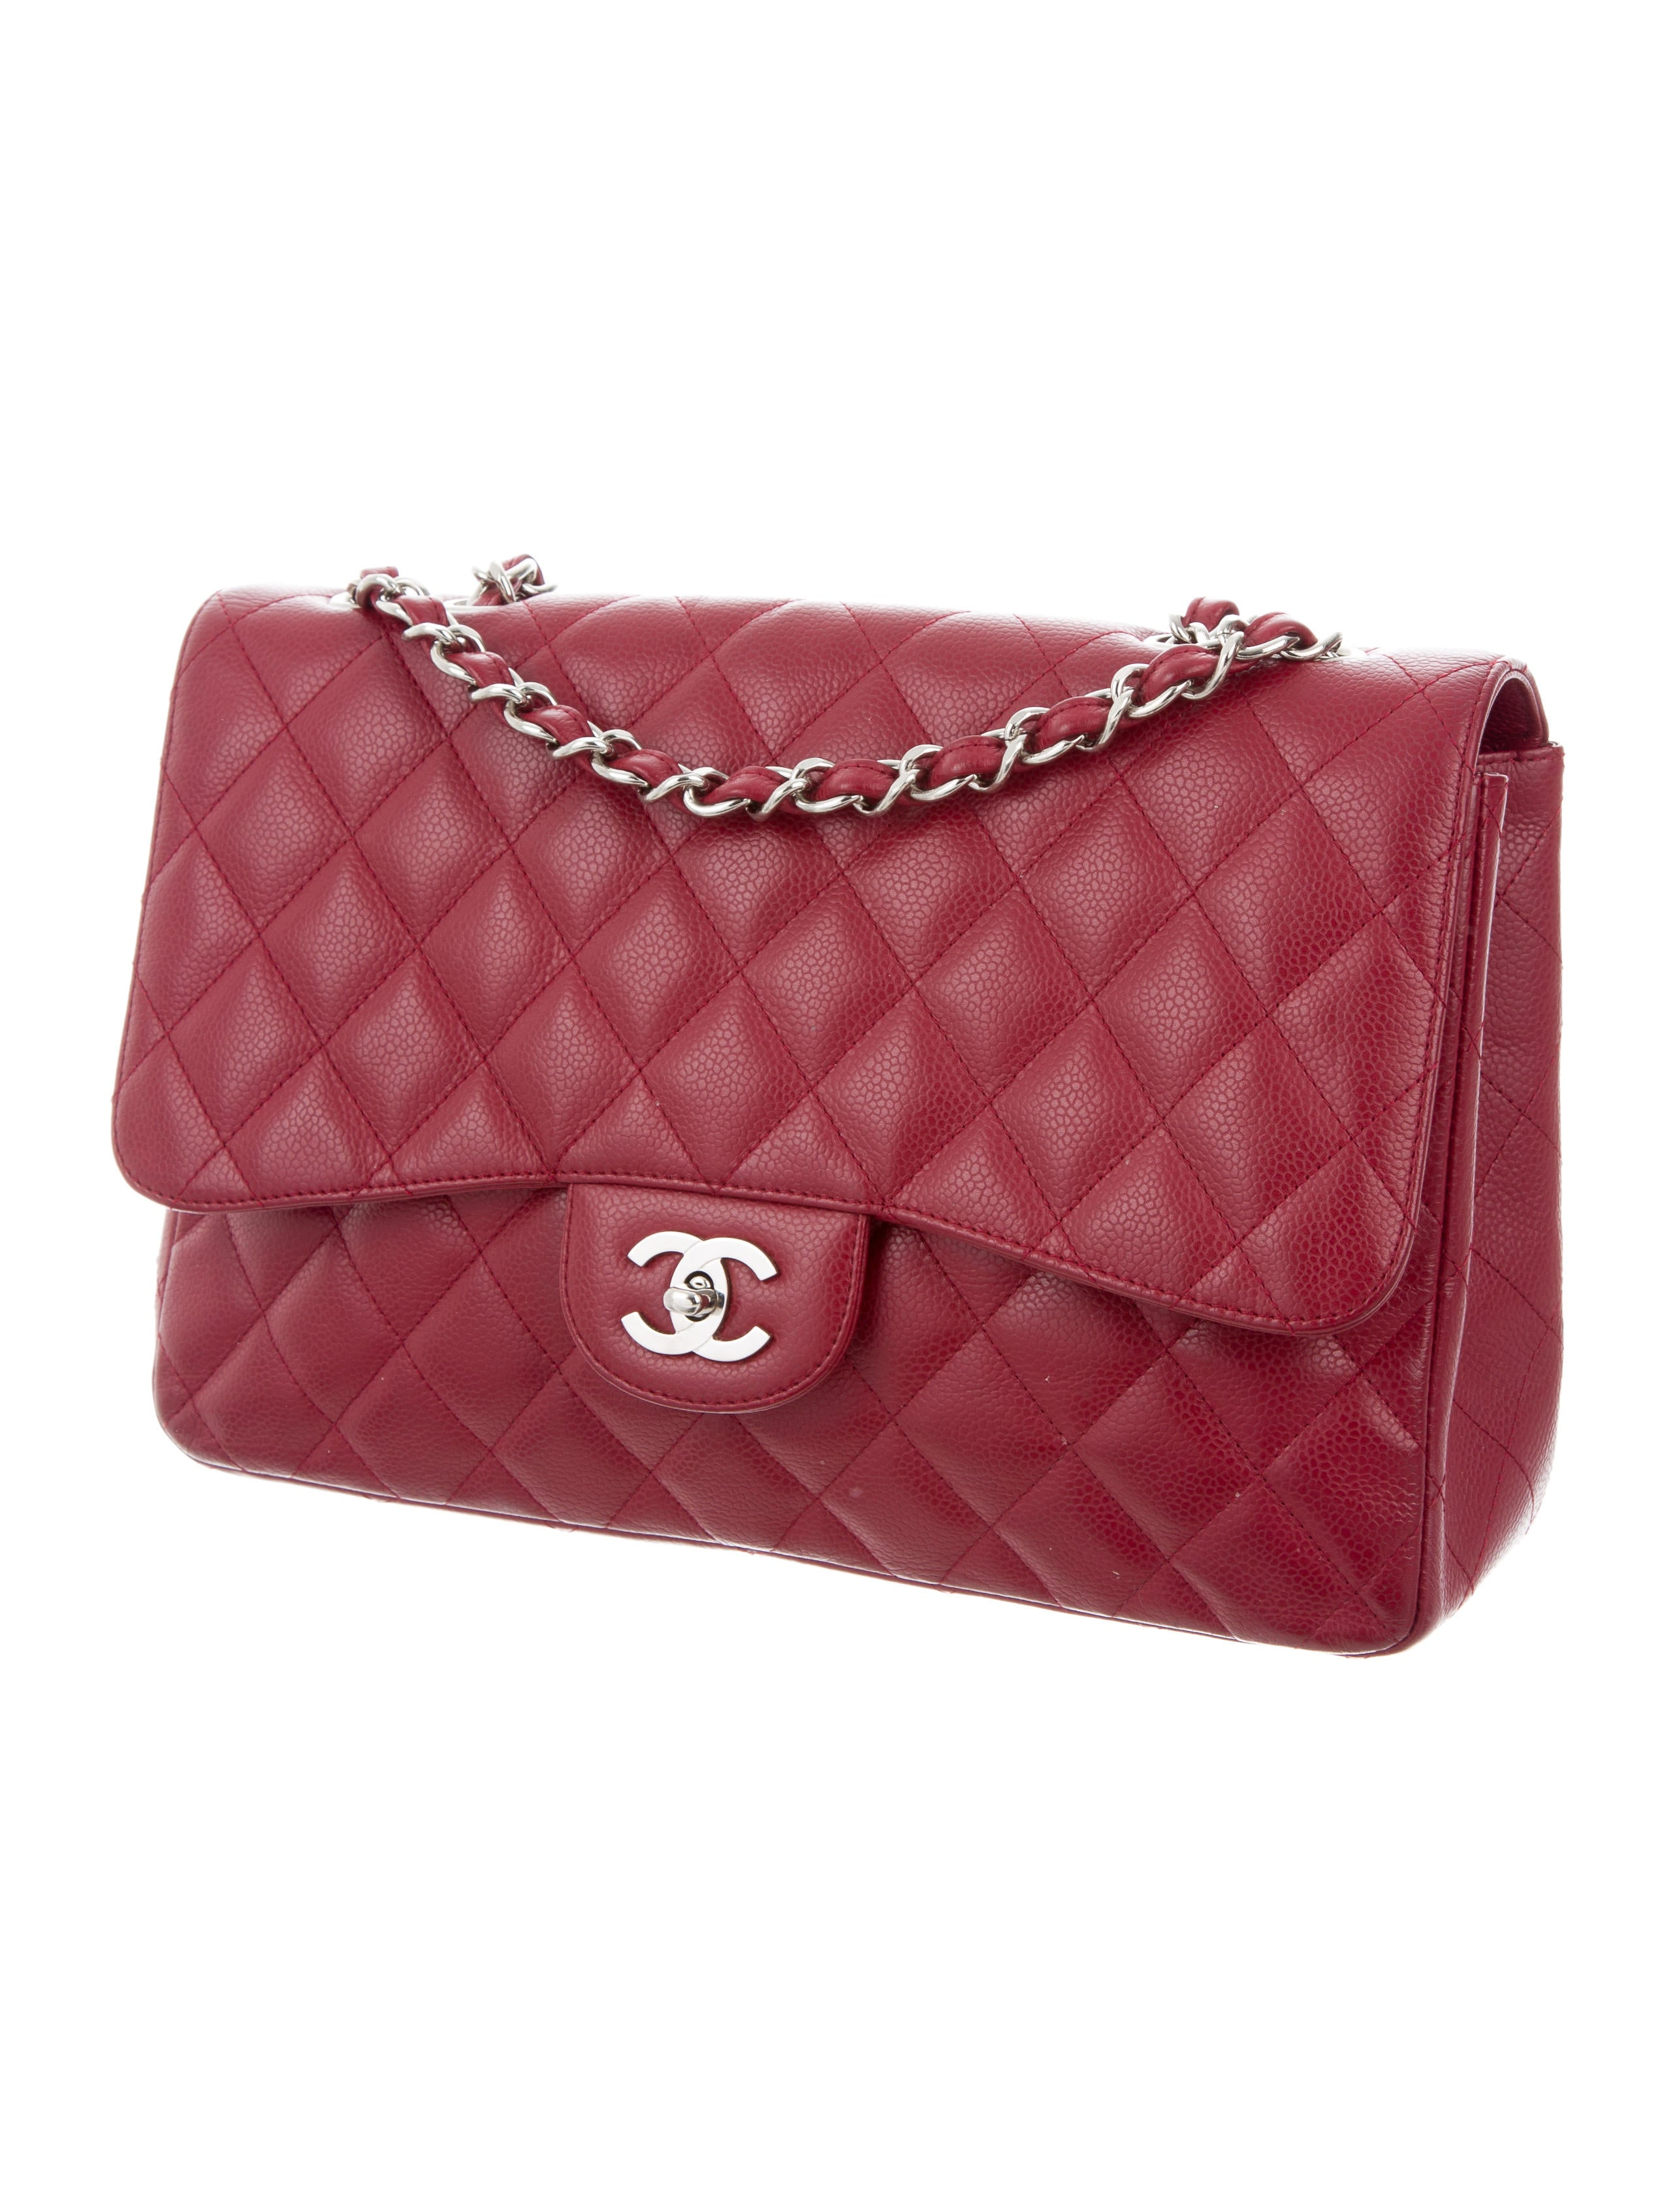 b407b7d7393f80 Chanel Women's Classic Jumbo Flap Bag A01112 Coffee   Stanford ...